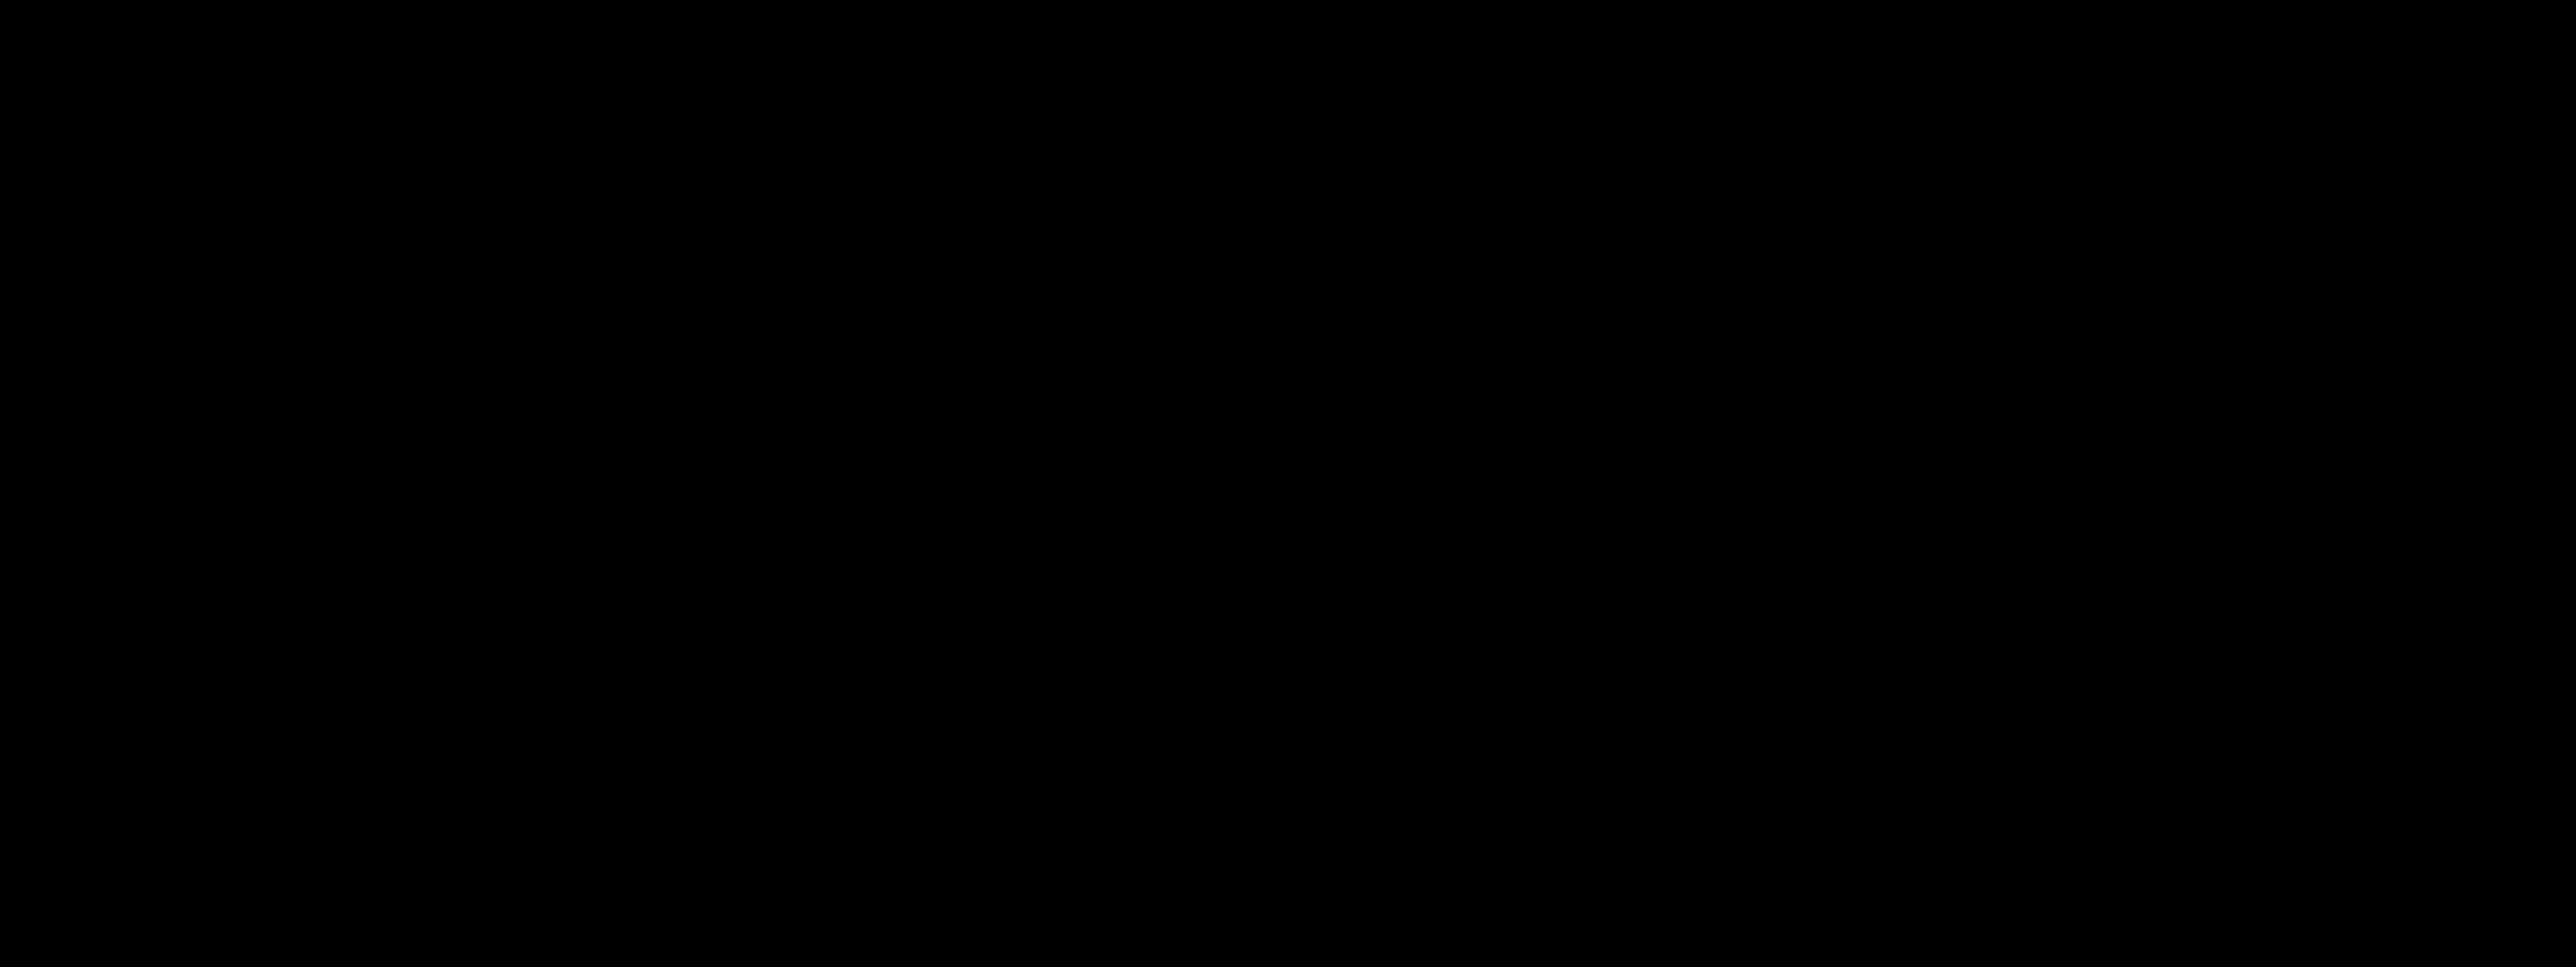 Kung Carl Hotel – Logos Download